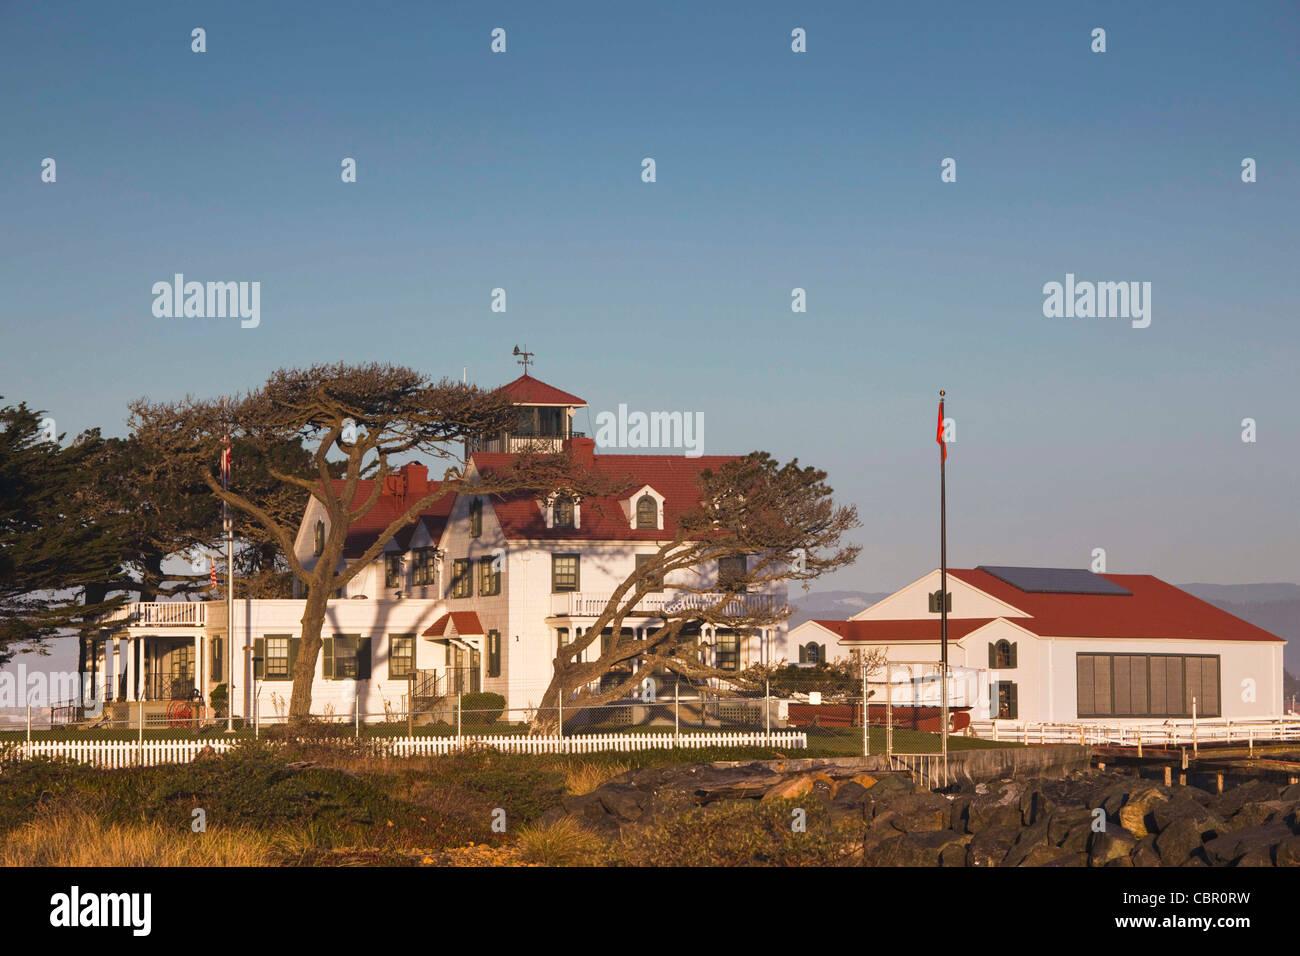 USA, California, Northern California, North Coast, Samoa, US Coastguard Station, Humbolt Bay - Stock Image